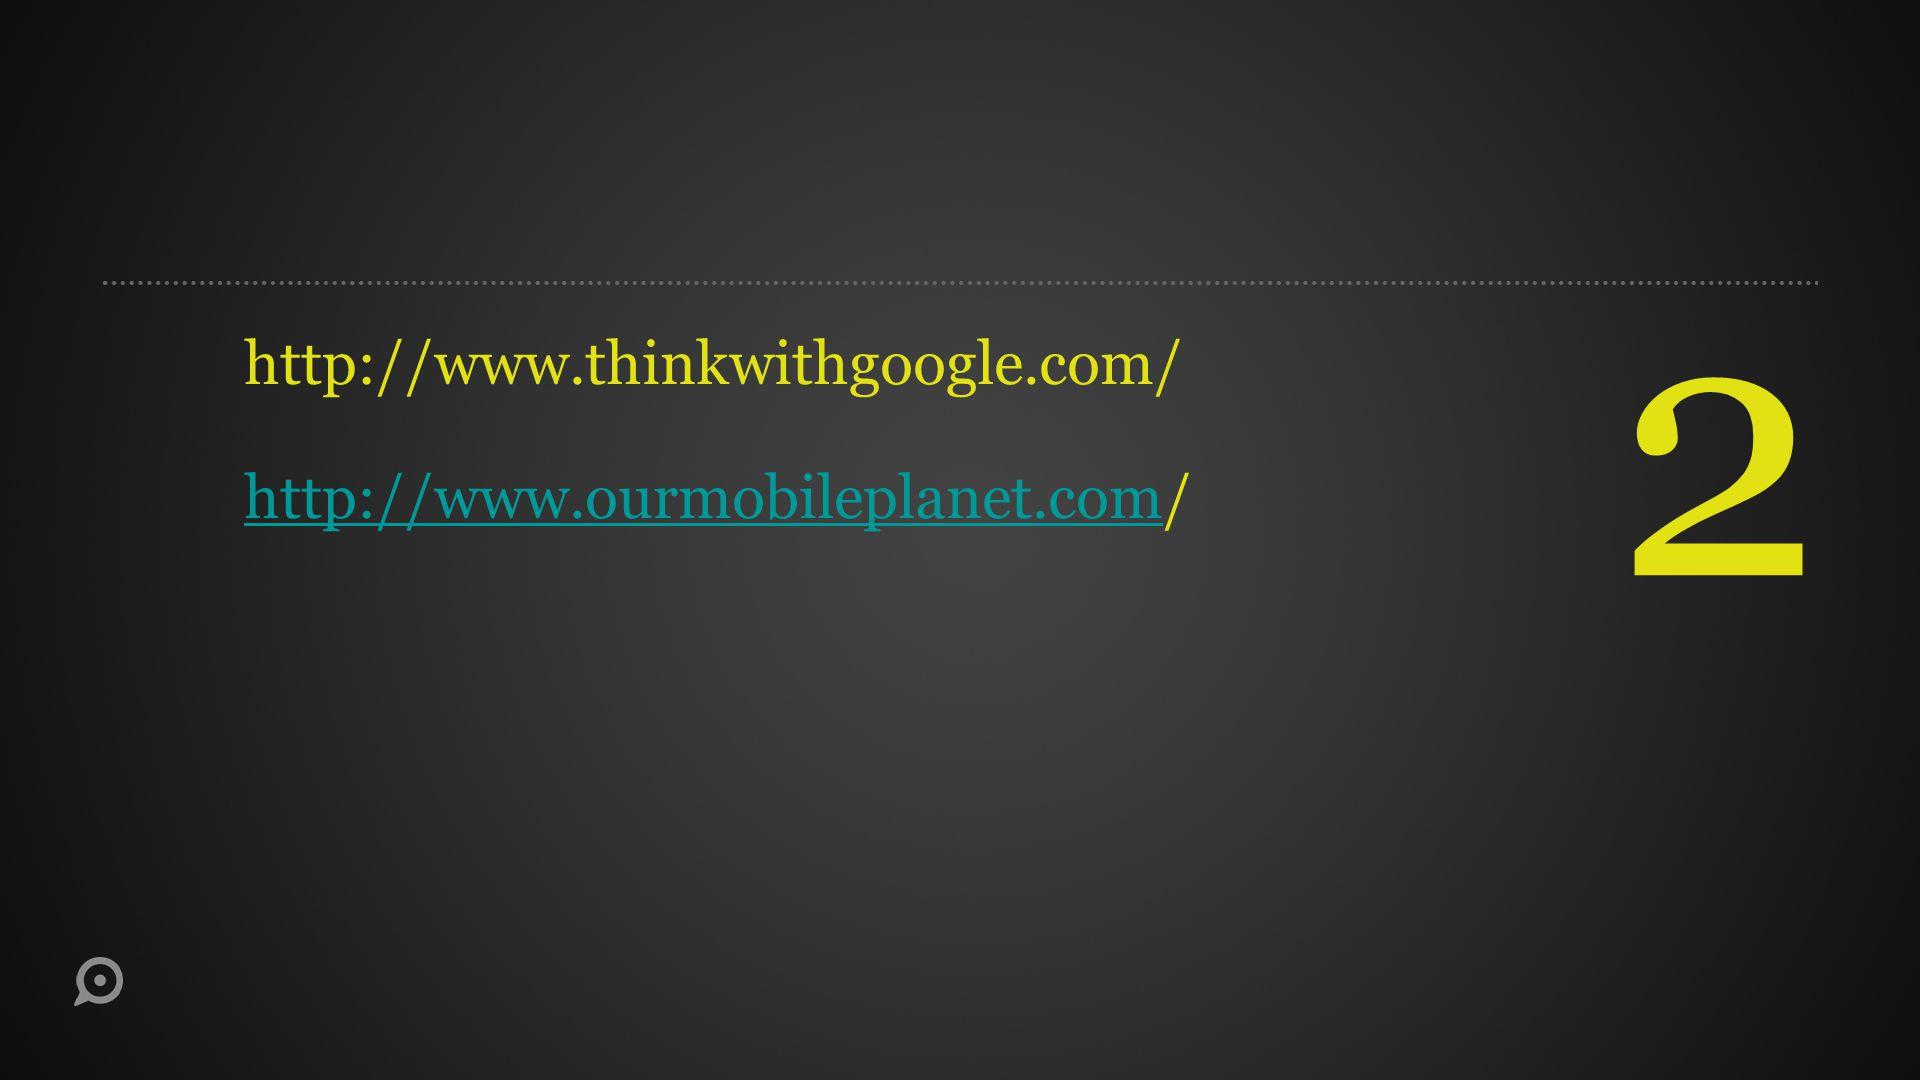 2 http://www.thinkwithgoogle.com/ http://www.ourmobileplanet.comhttp://www.ourmobileplanet.com/